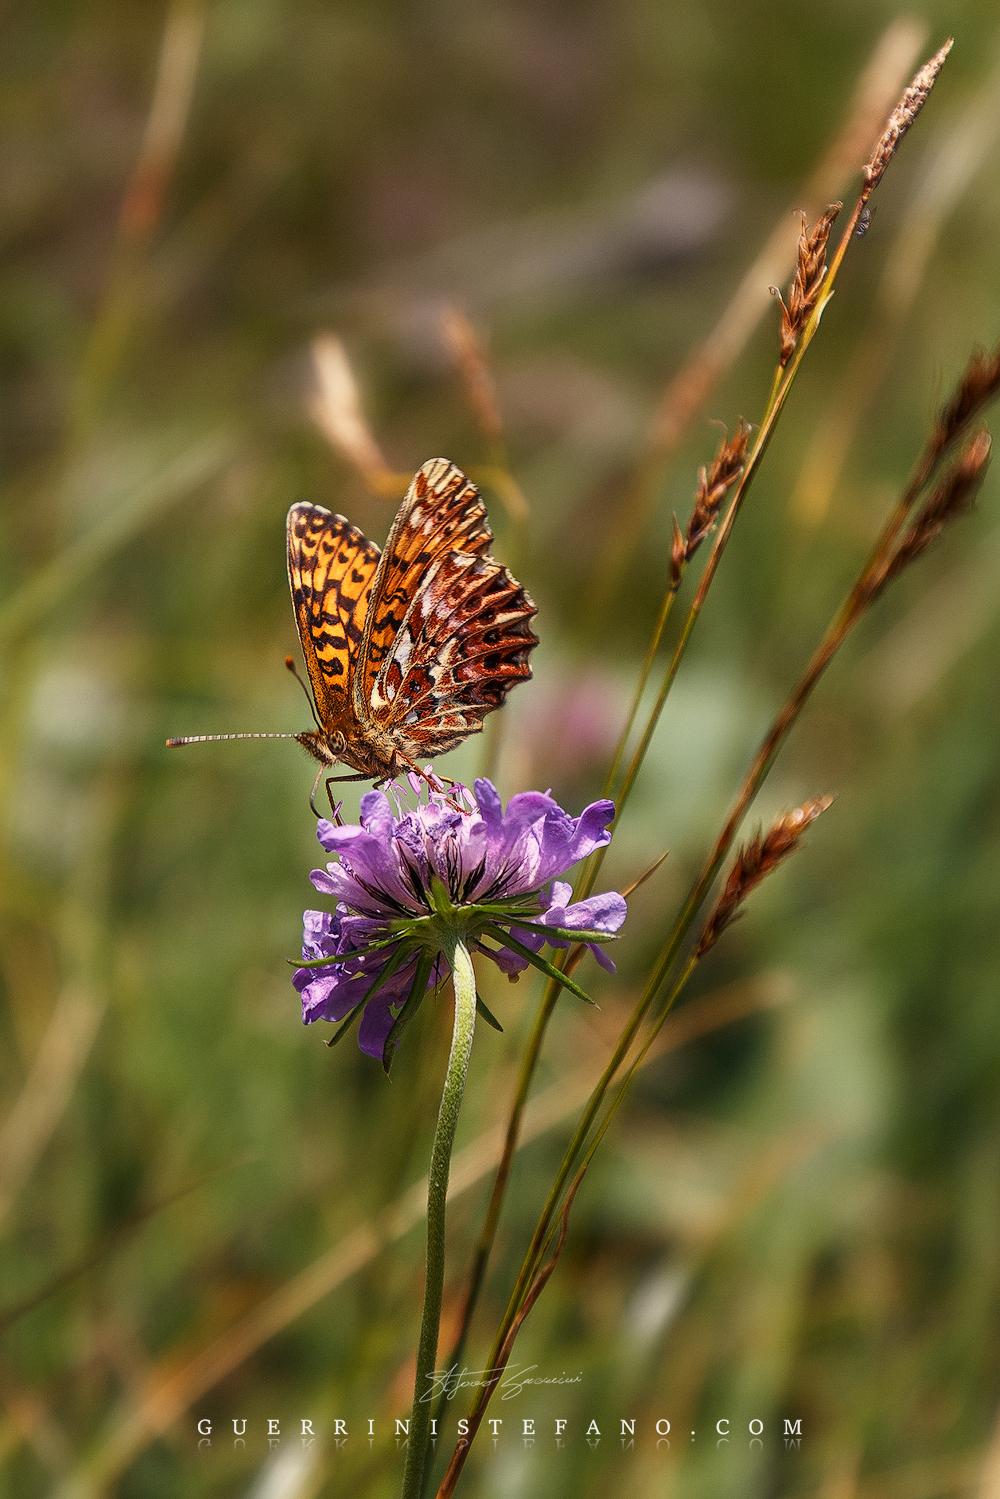 Farfalla-by-Guerrini-Stefano